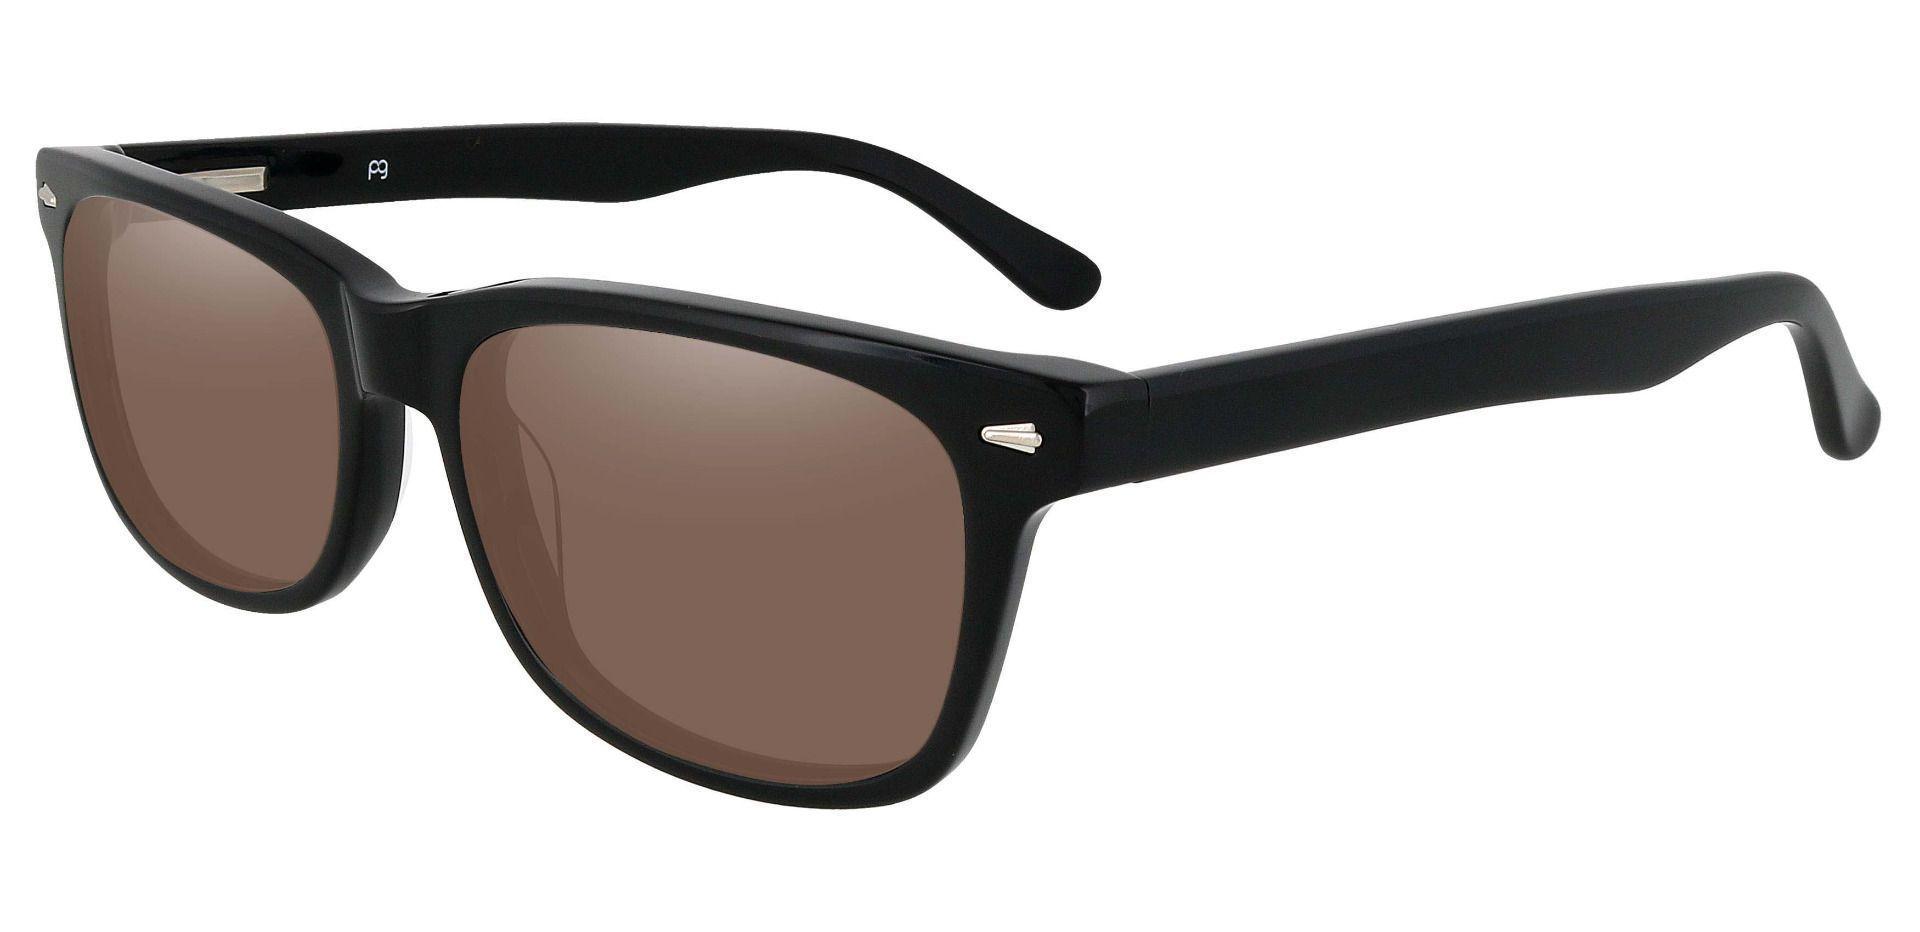 Hendrix Rectangle Lined Bifocal Sunglasses - Black Frame With Brown Lenses